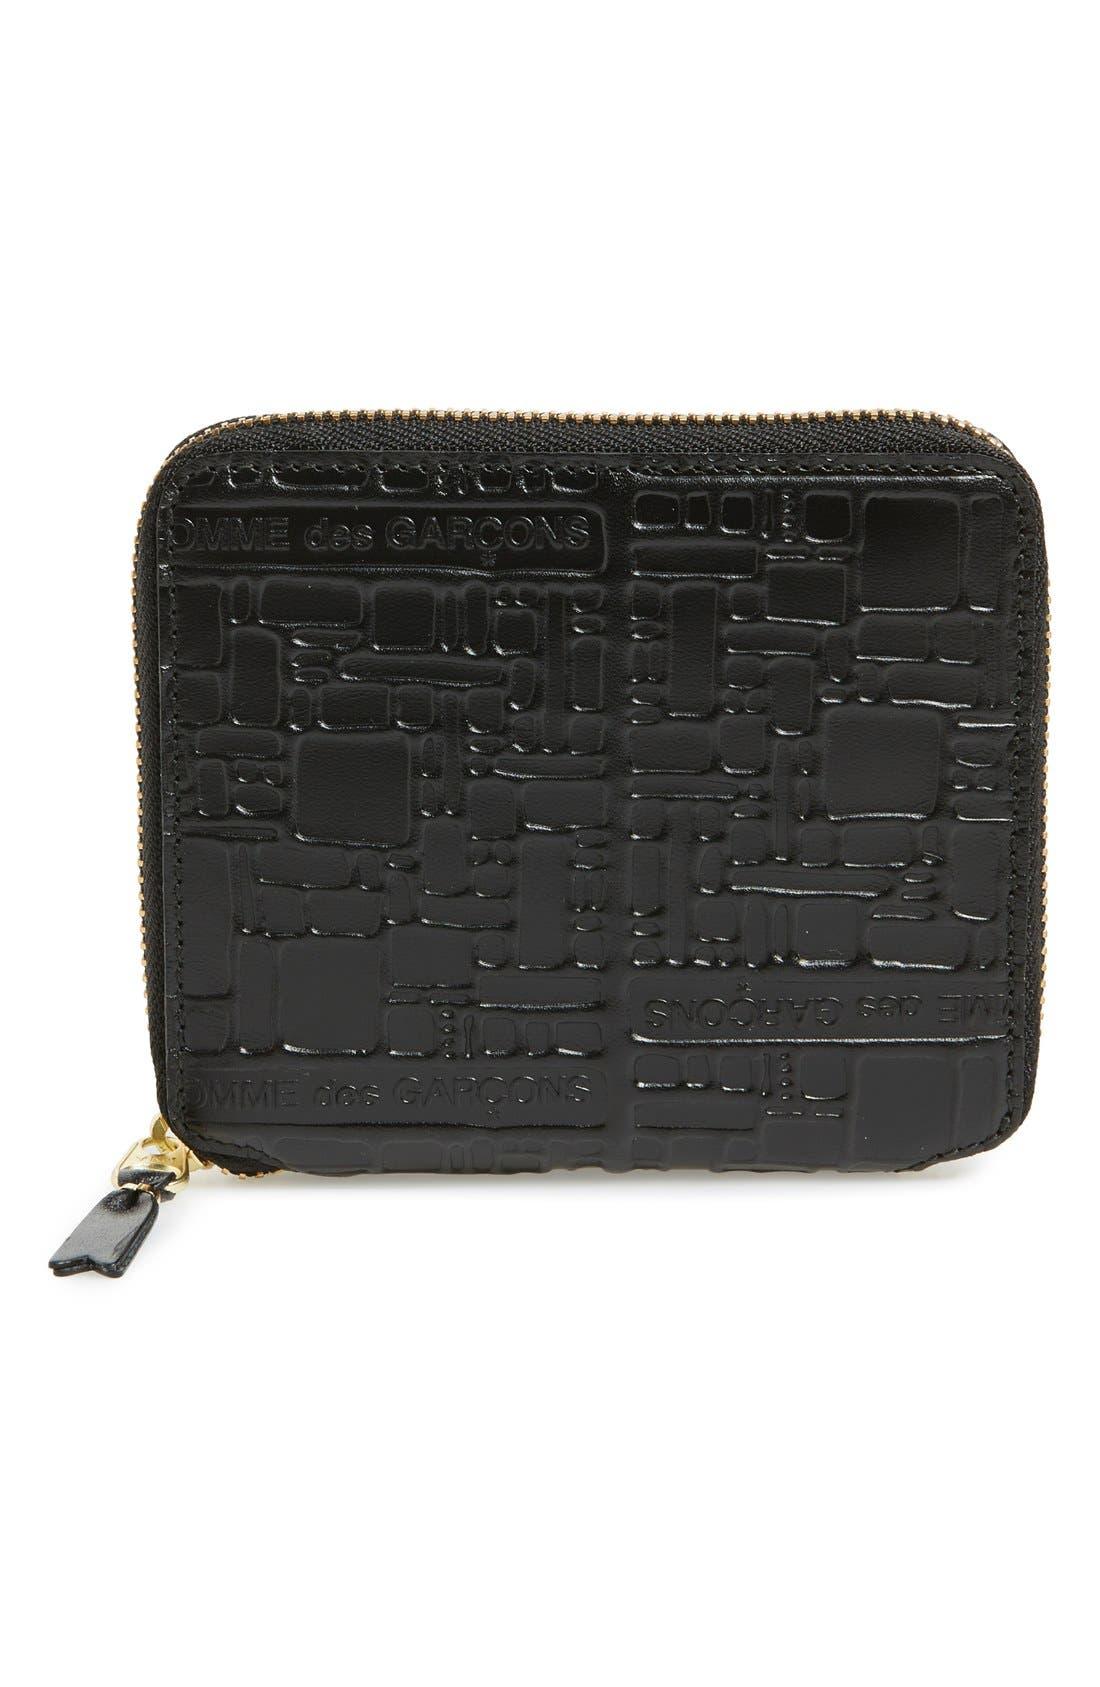 Comme de Garçons Embossed French Wallet,                         Main,                         color, Black